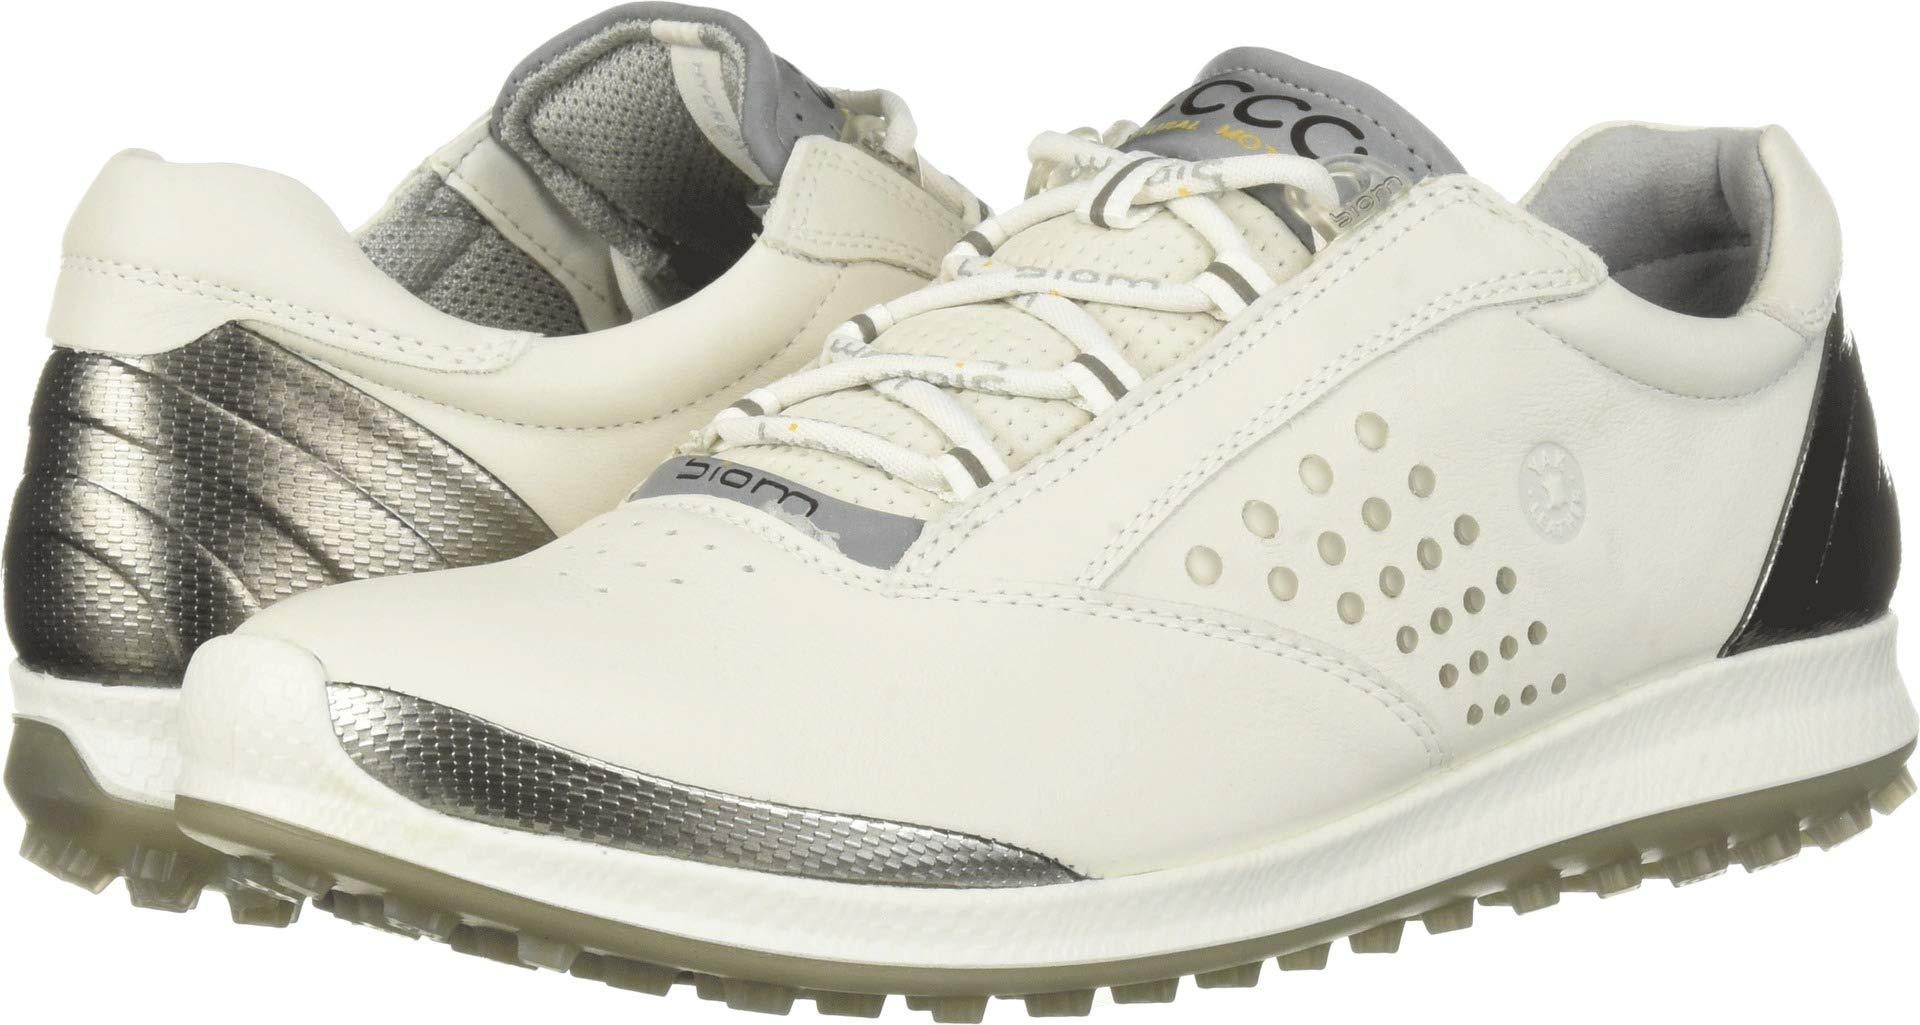 ECCO Women's Biom Hybrid 2 Golf Shoe, White Yak Leather, 7 M US by ECCO